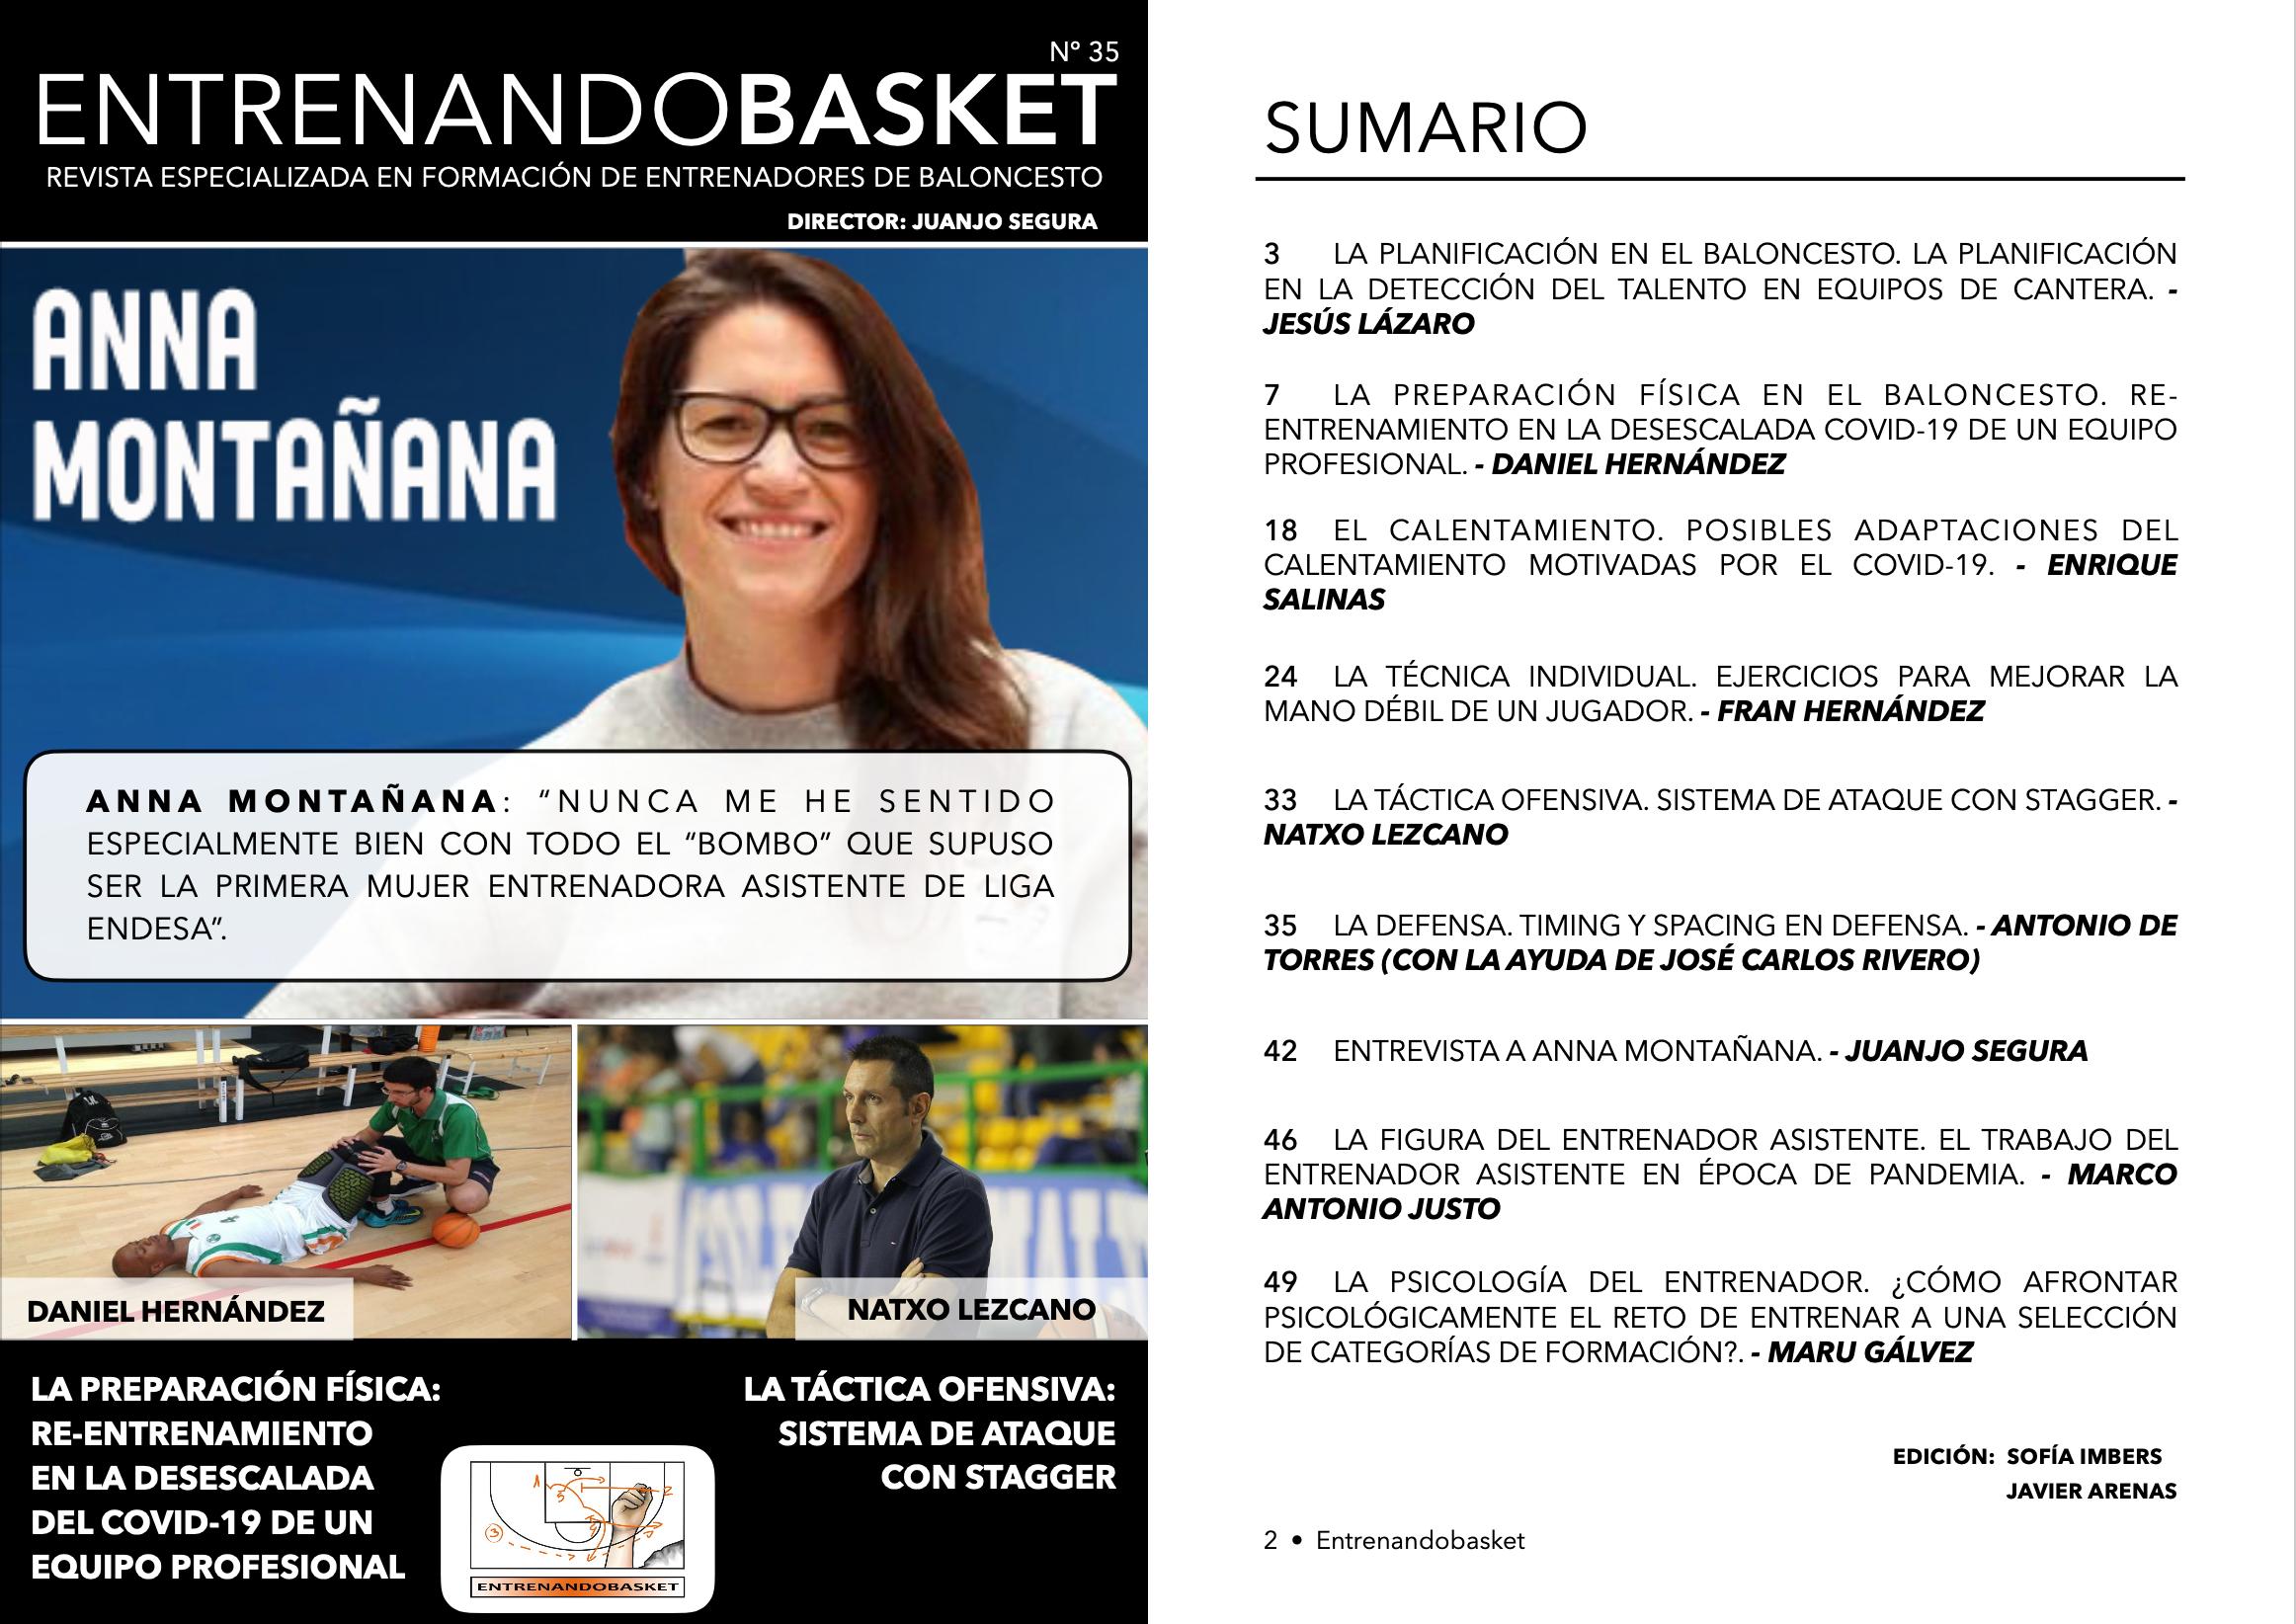 Entrenandobasket_35